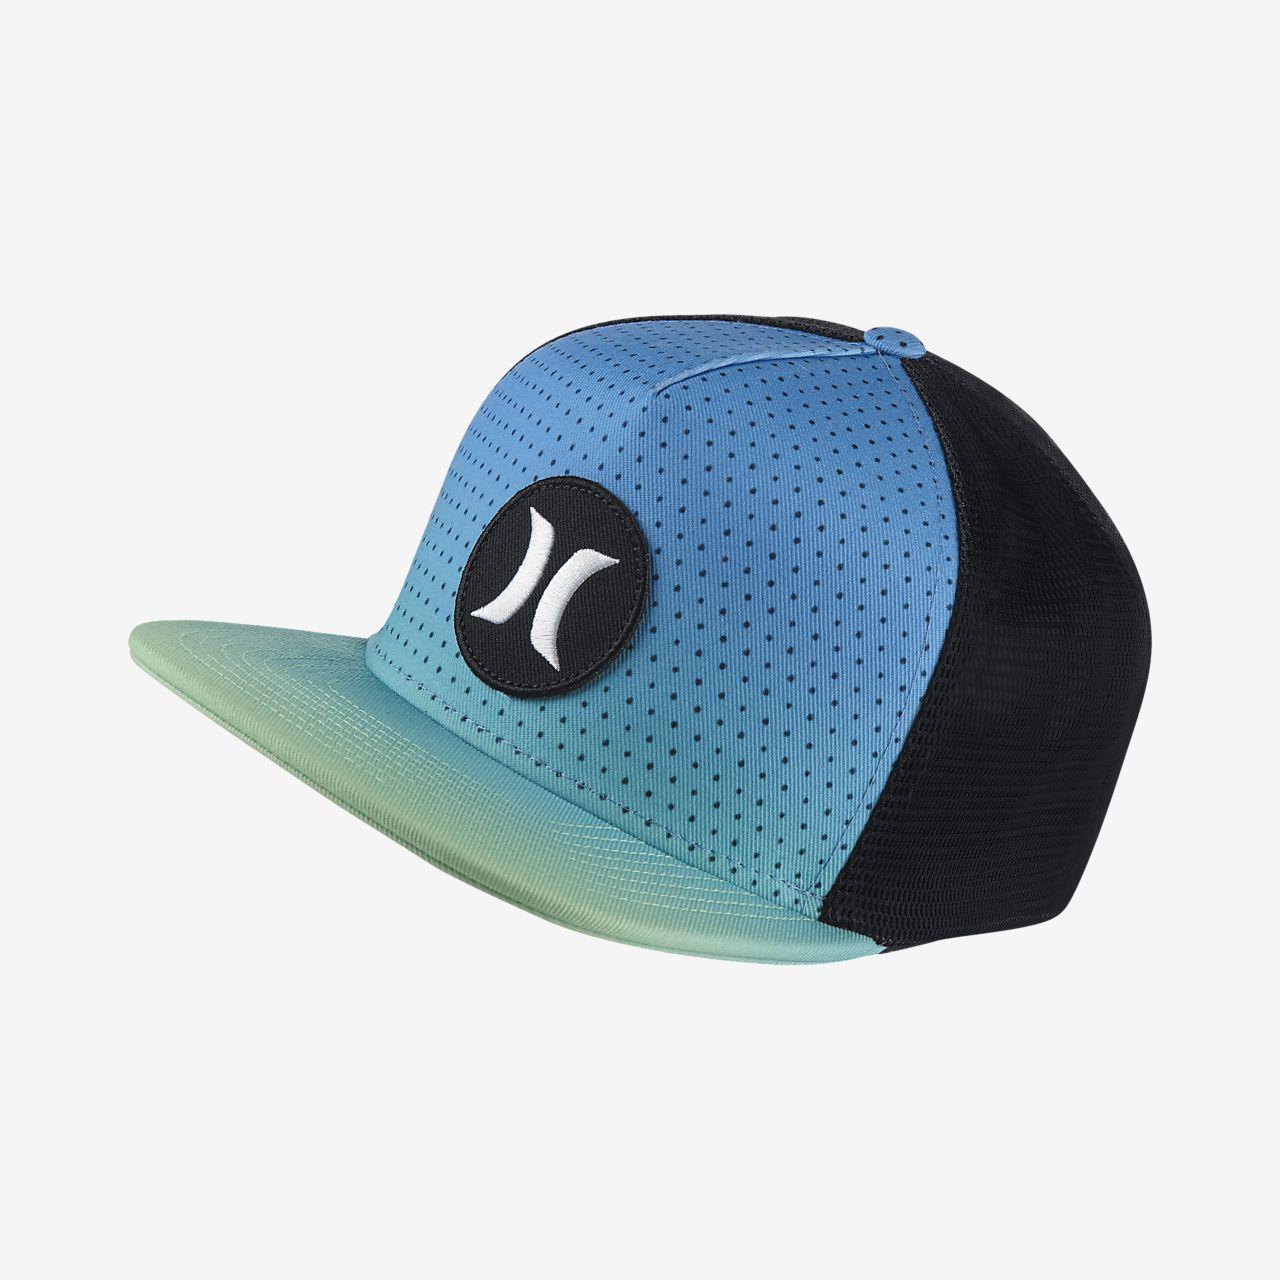 8abfb95be4db Hurley Third Reef Unisex Adjustable Hat. Nike.com IL